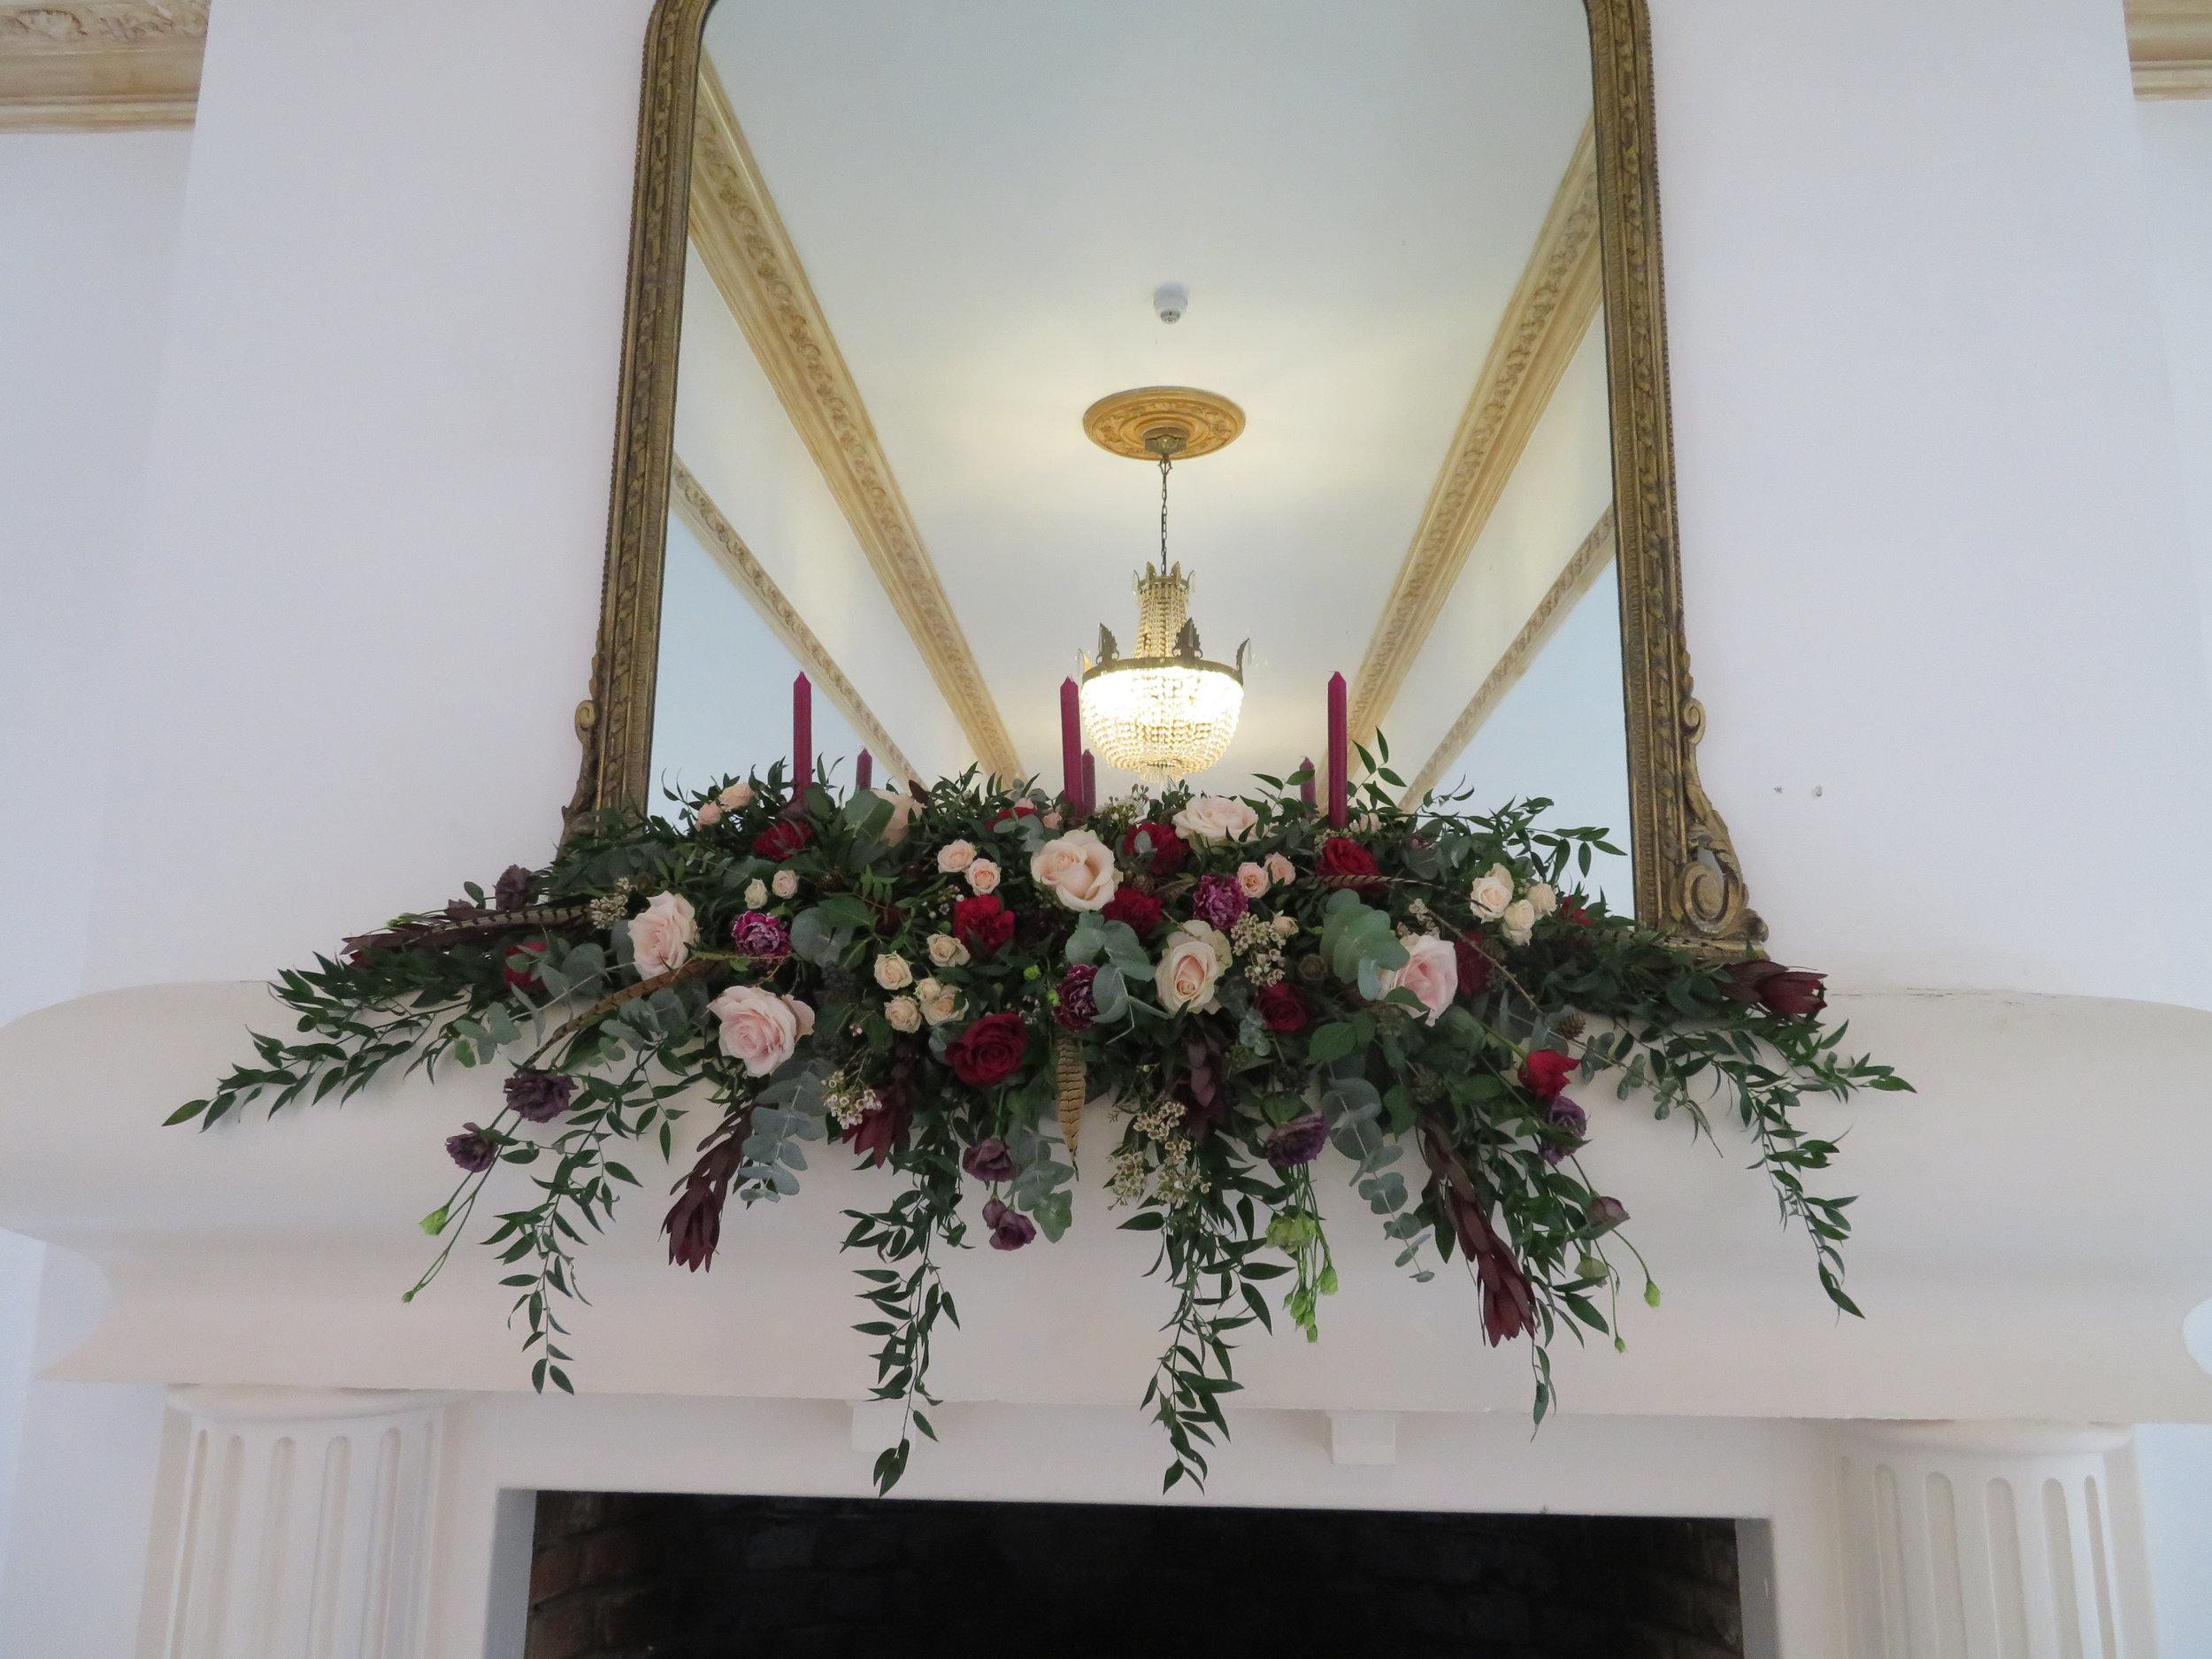 The mantelpiece arrangement which was 6 foot across